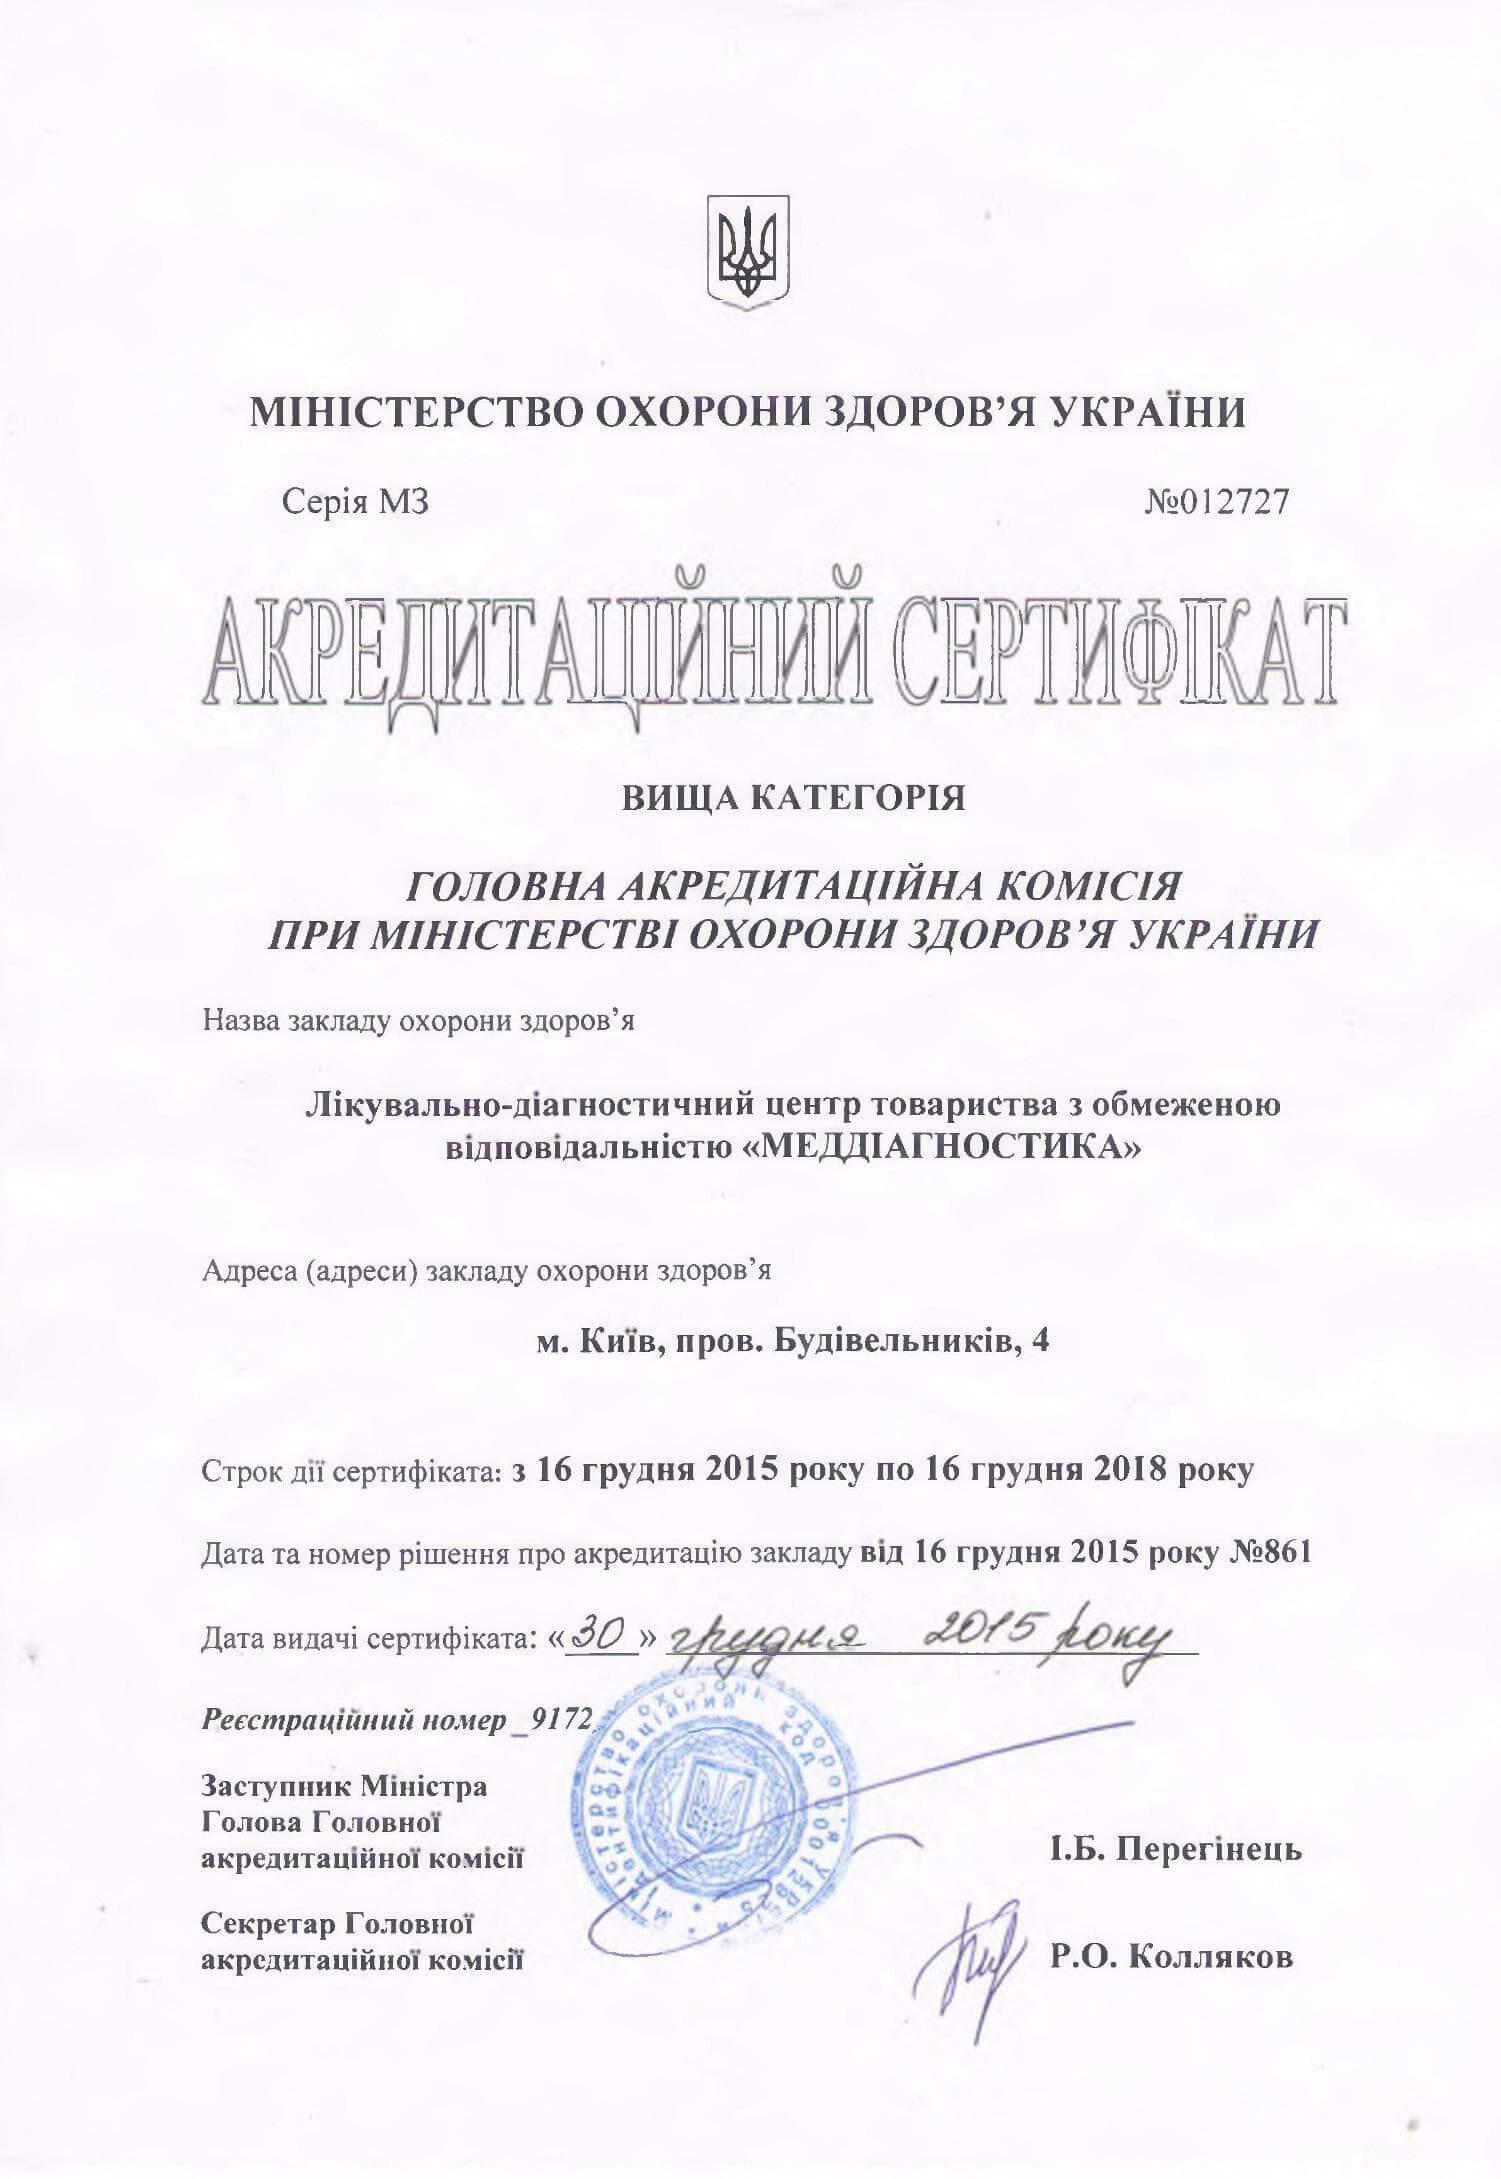 Akkreditatsi nnIy sertifikat